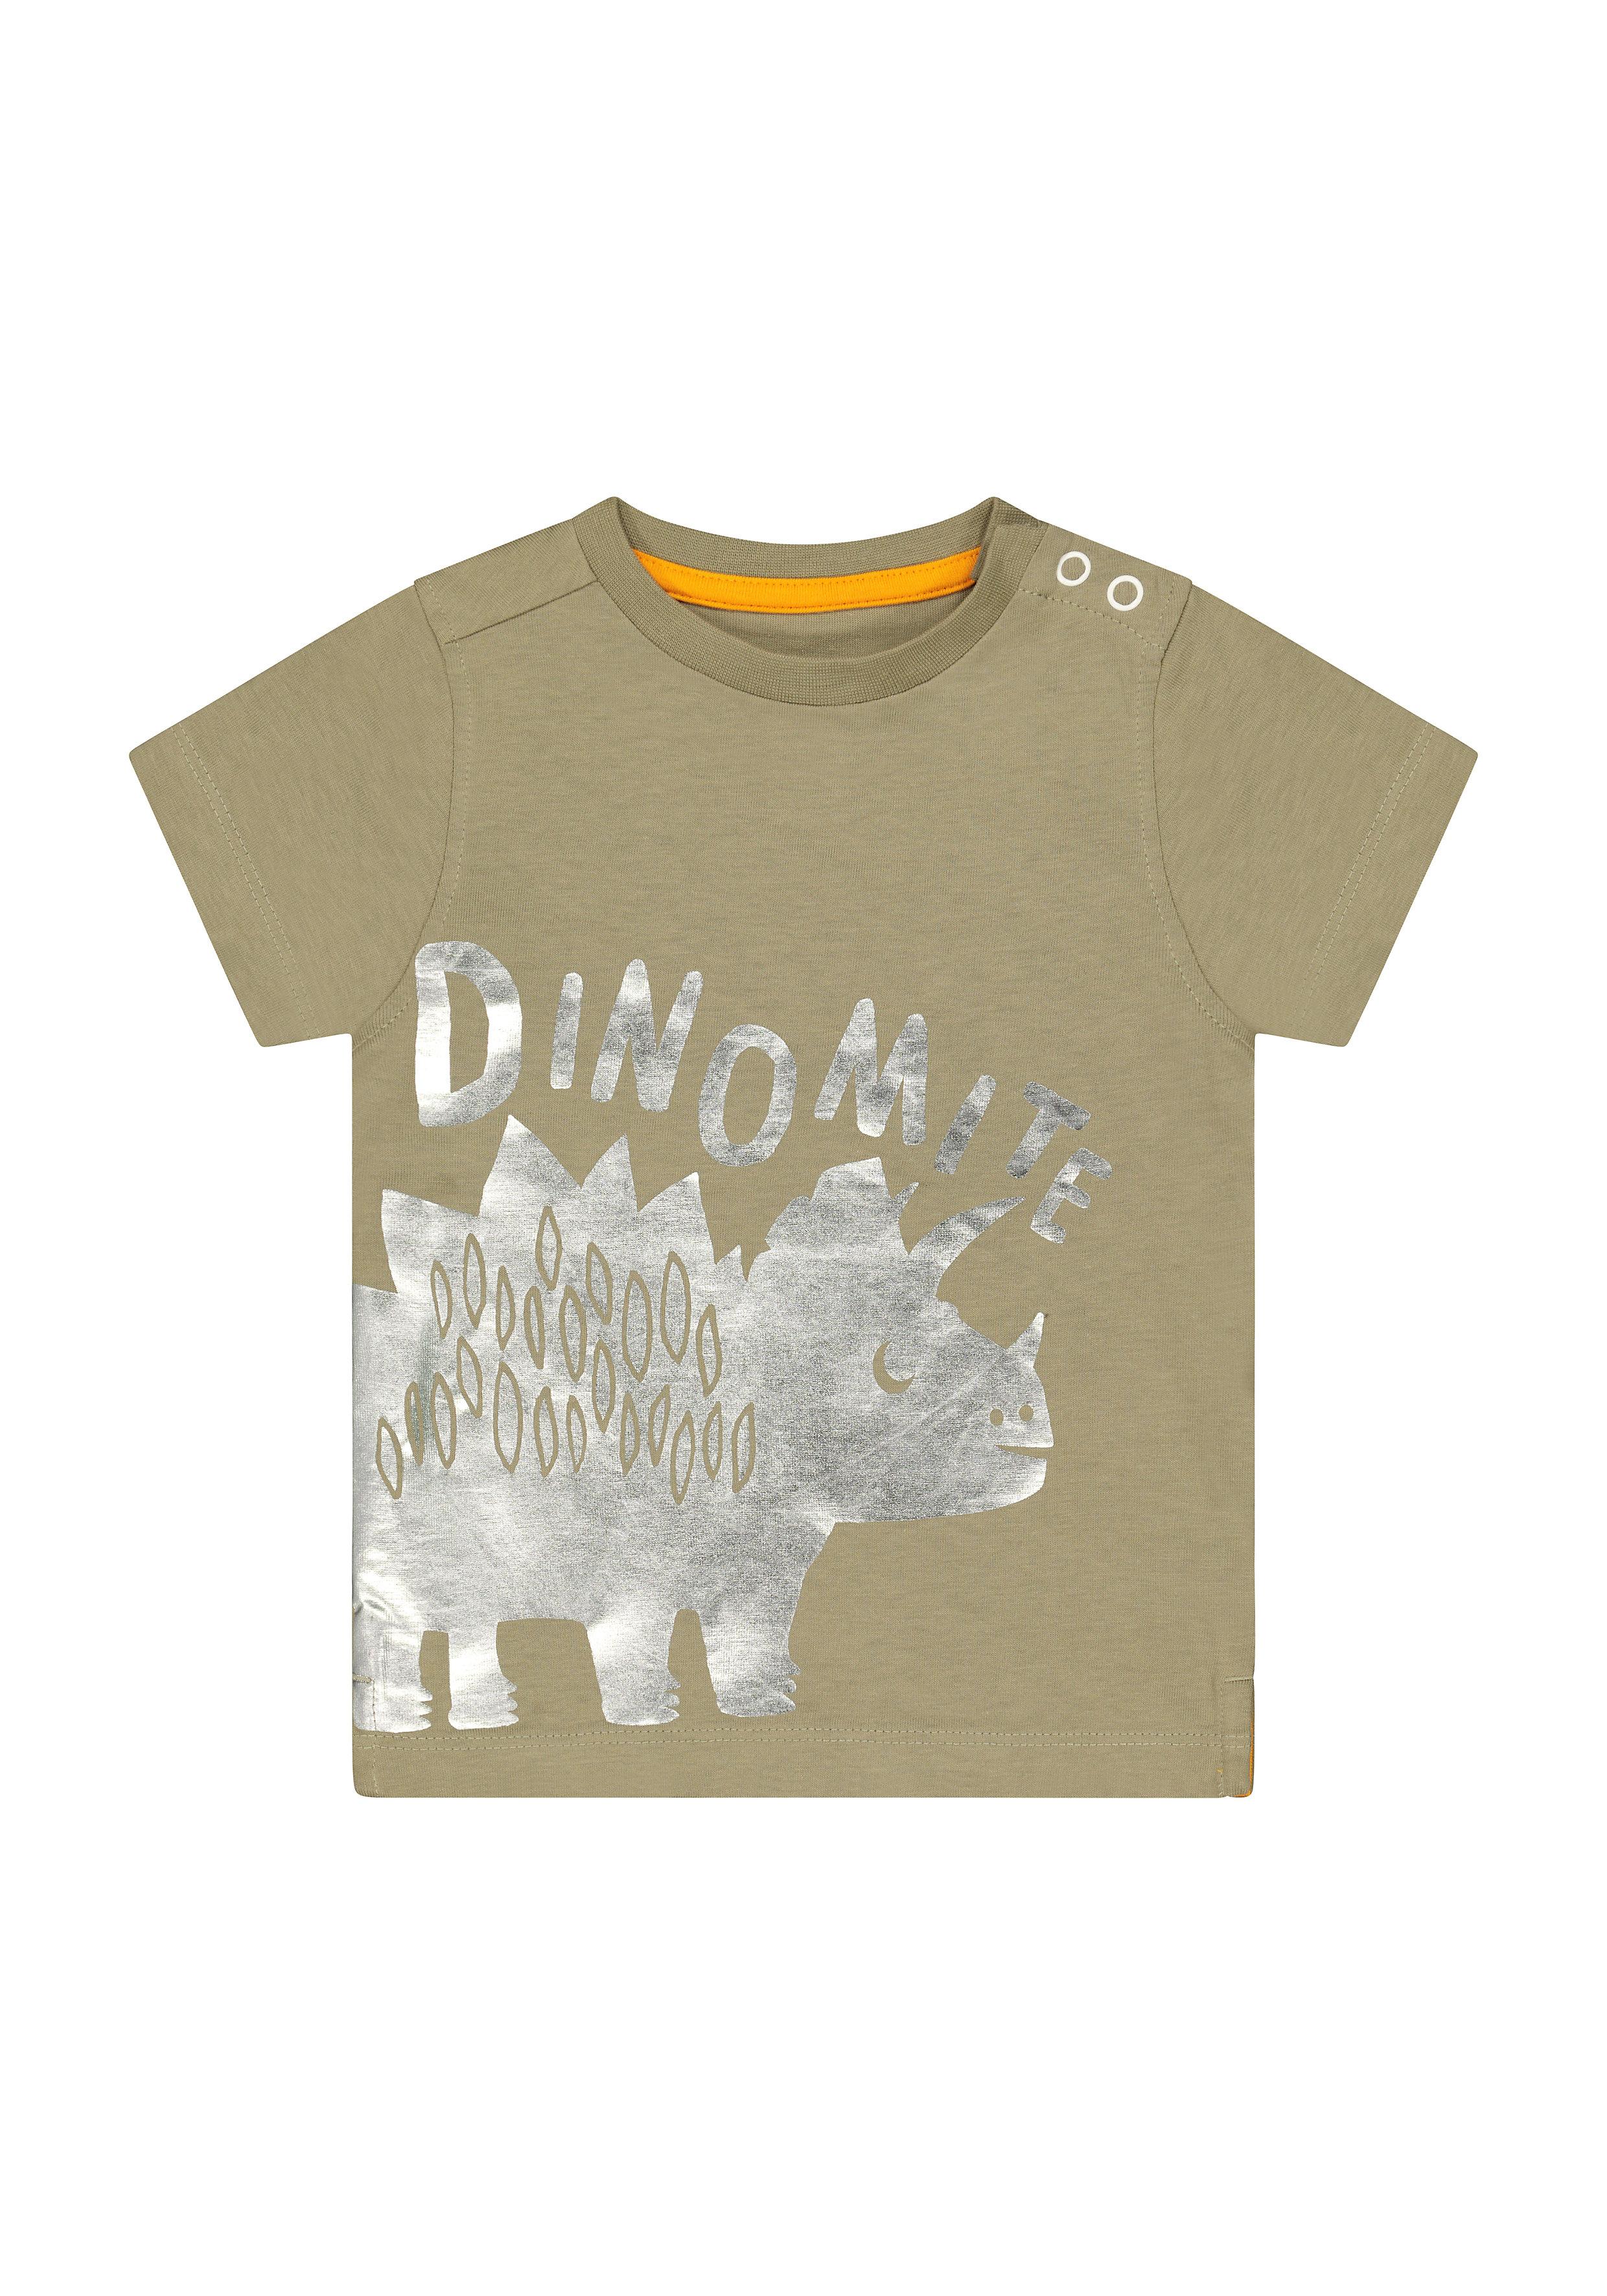 Mothercare   Boys Half Sleeves Round Neck T-shirts  - Khaki